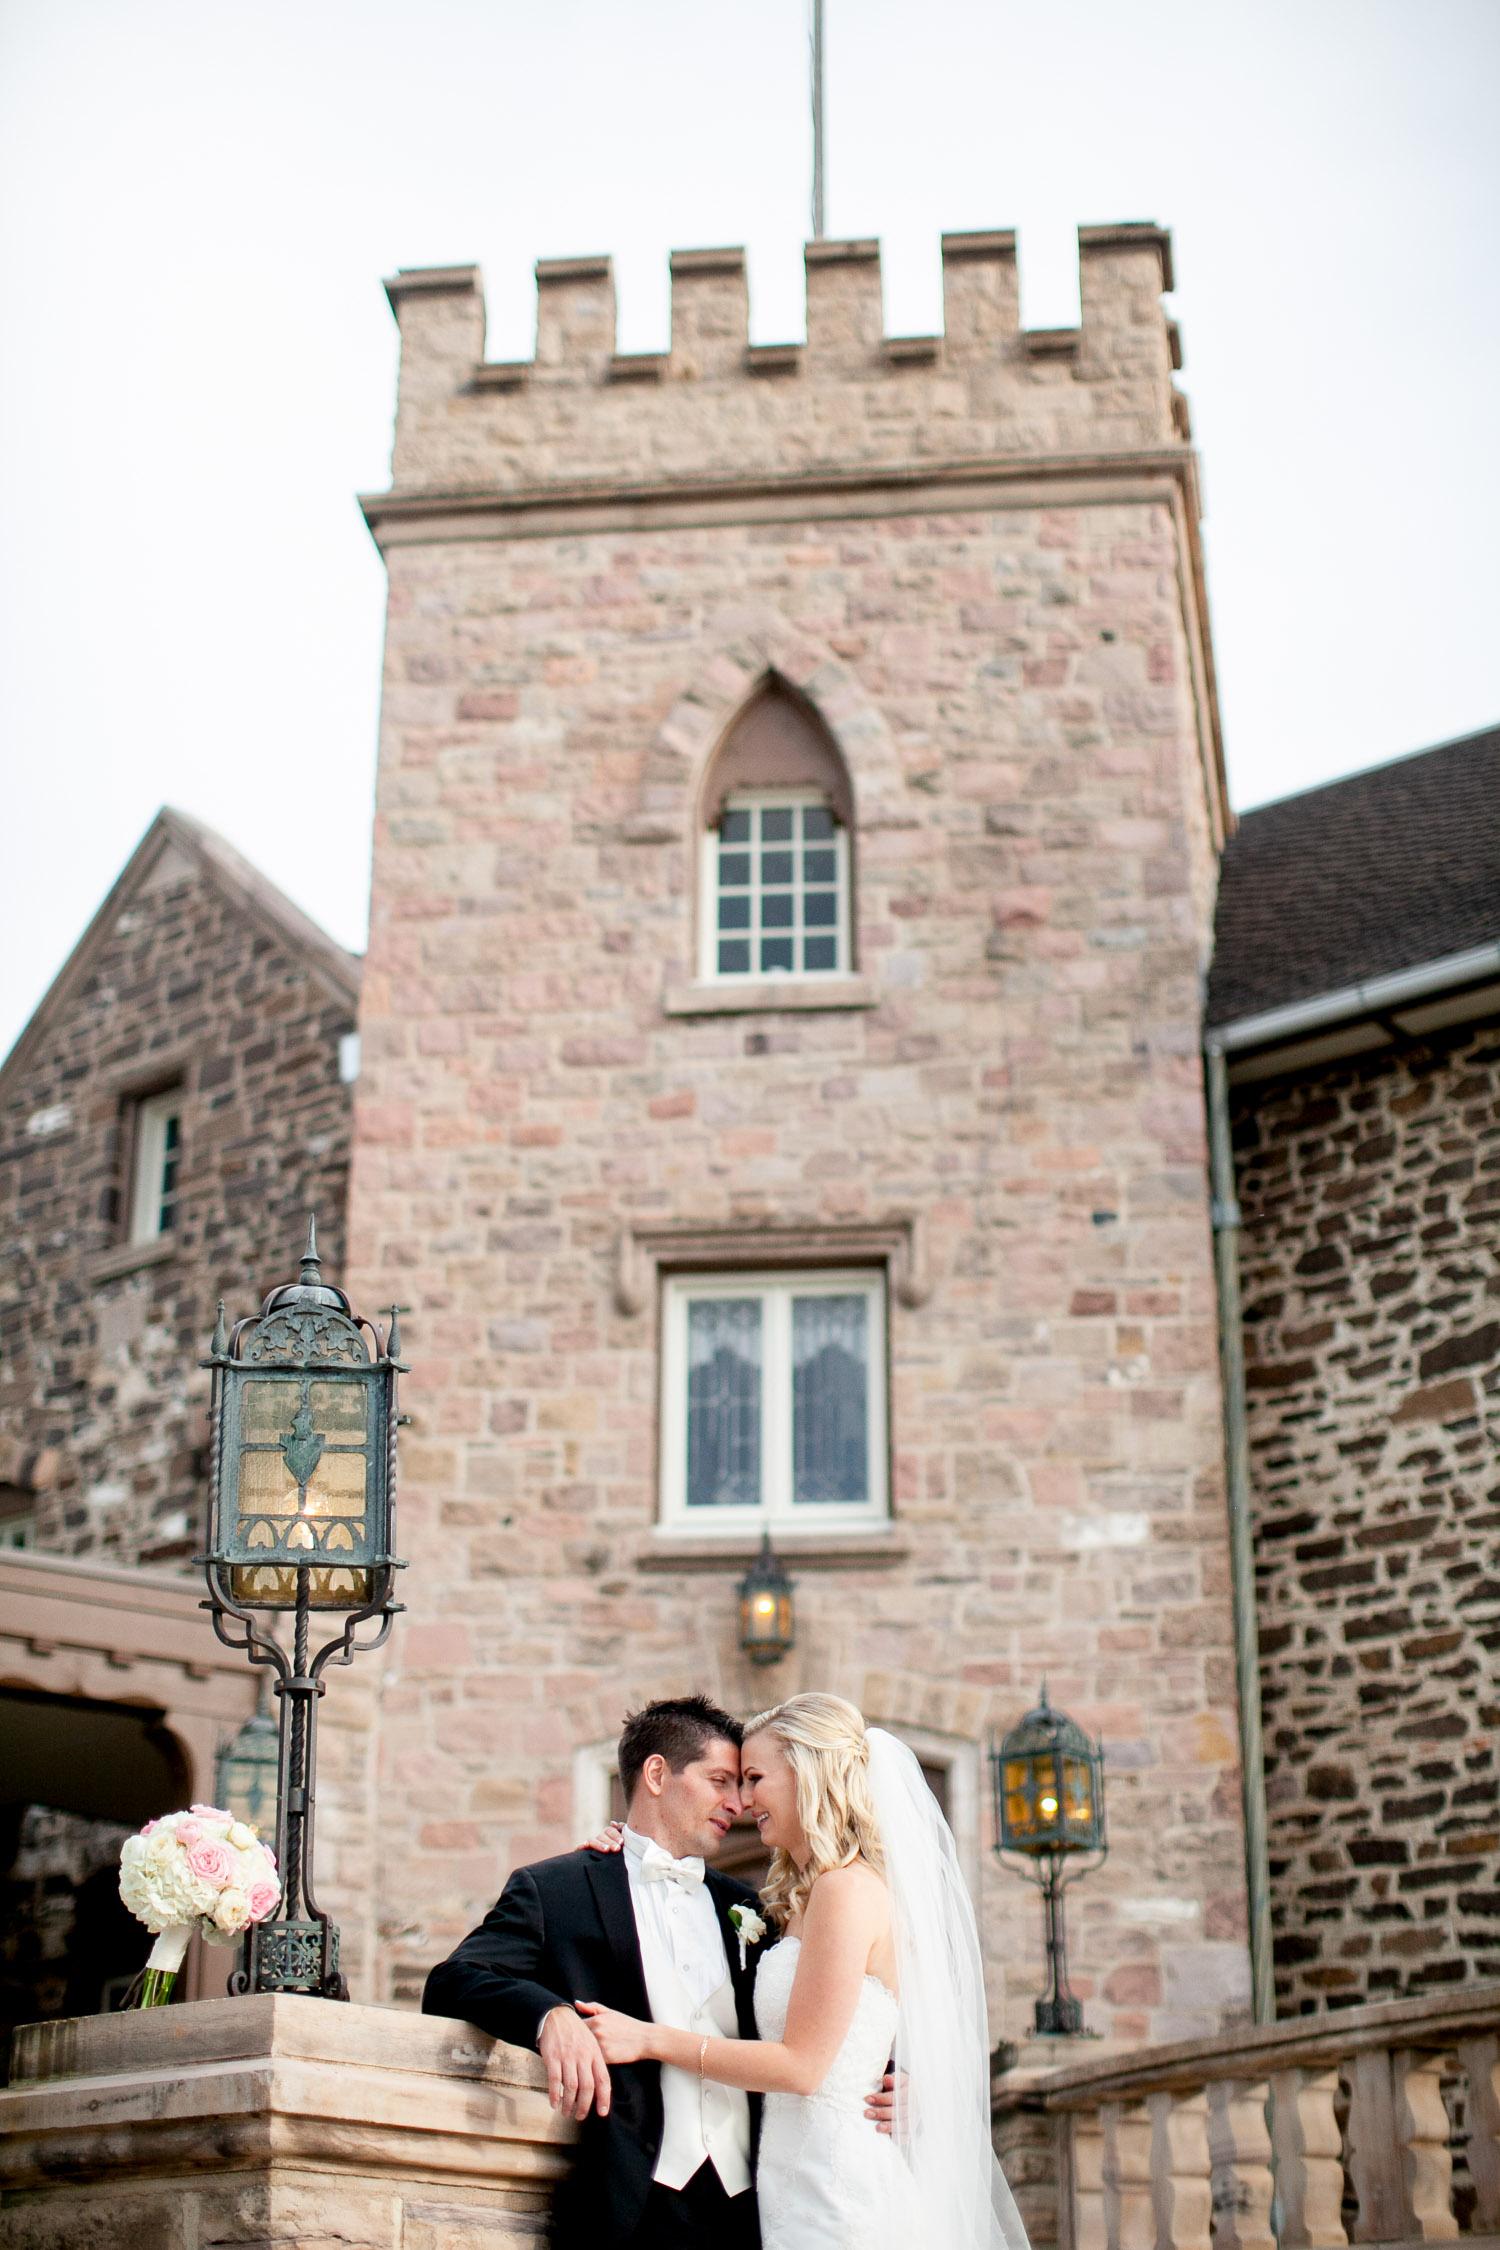 JMPHOTOART-Wedding-Photographer-181.jpg